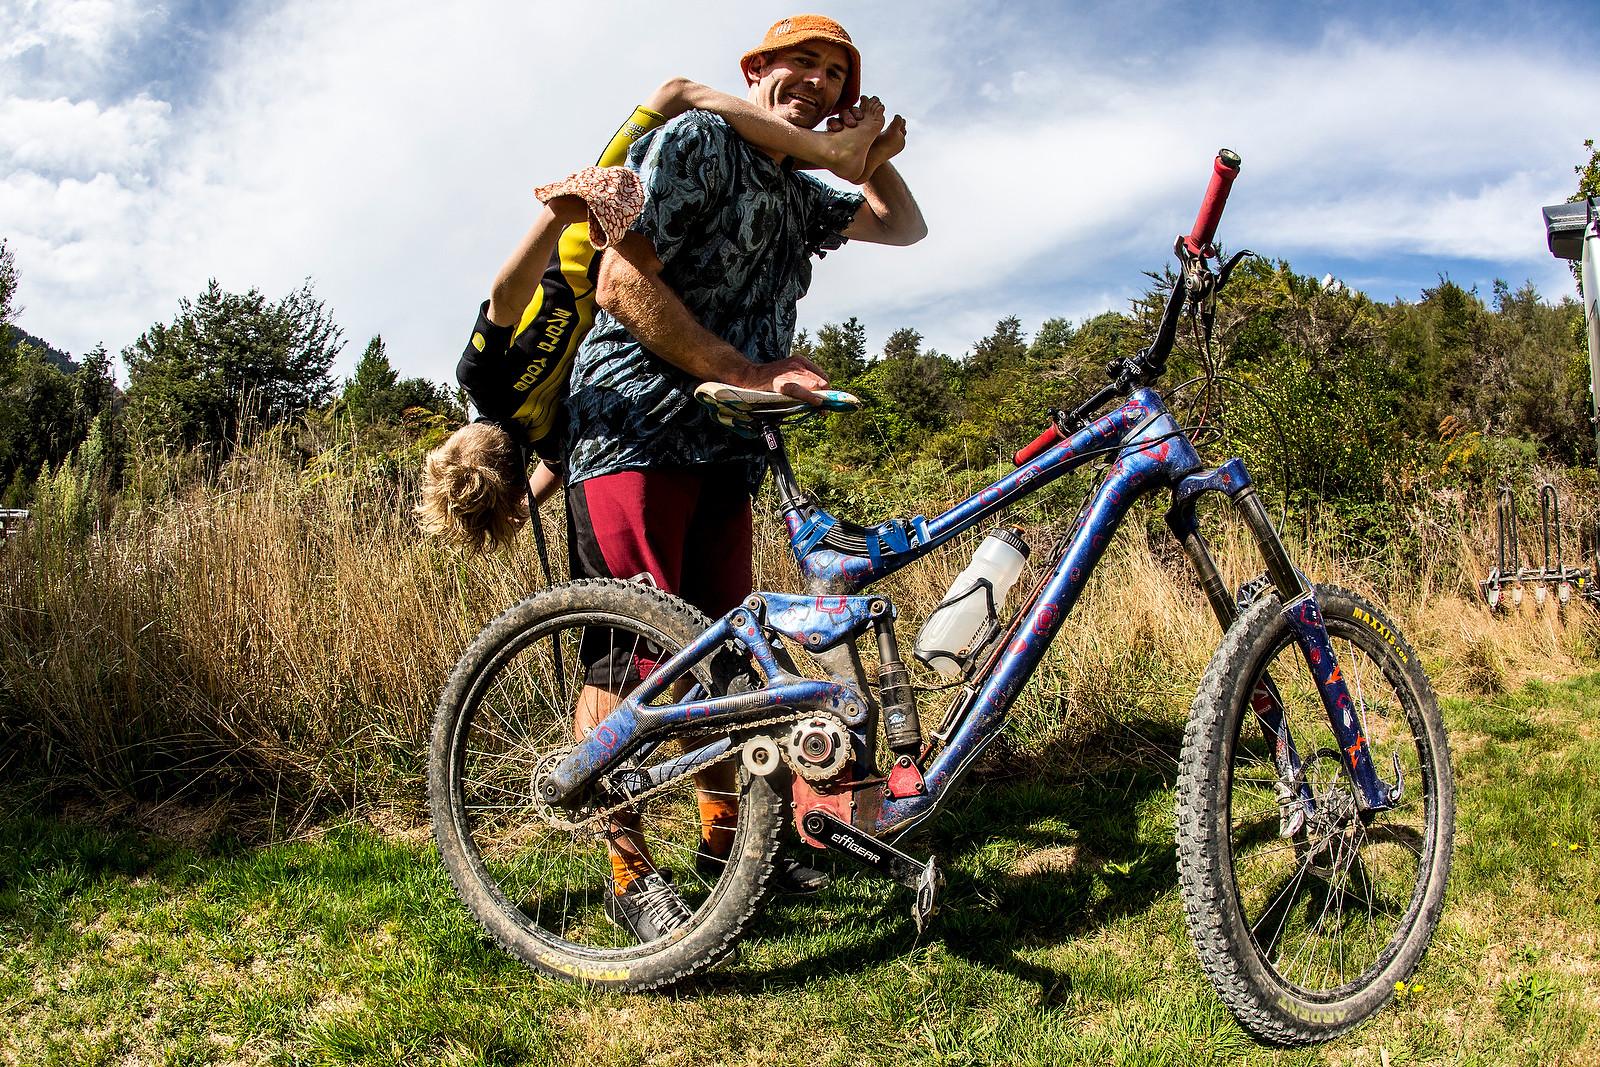 DIY Carbon Gearbox Enduro Bike - Richard Goldsbury's Bike - DIY Carbon Gearbox Enduro Bike - Richard Goldsbury's Bike - Mountain Biking Pictures - Vital MTB